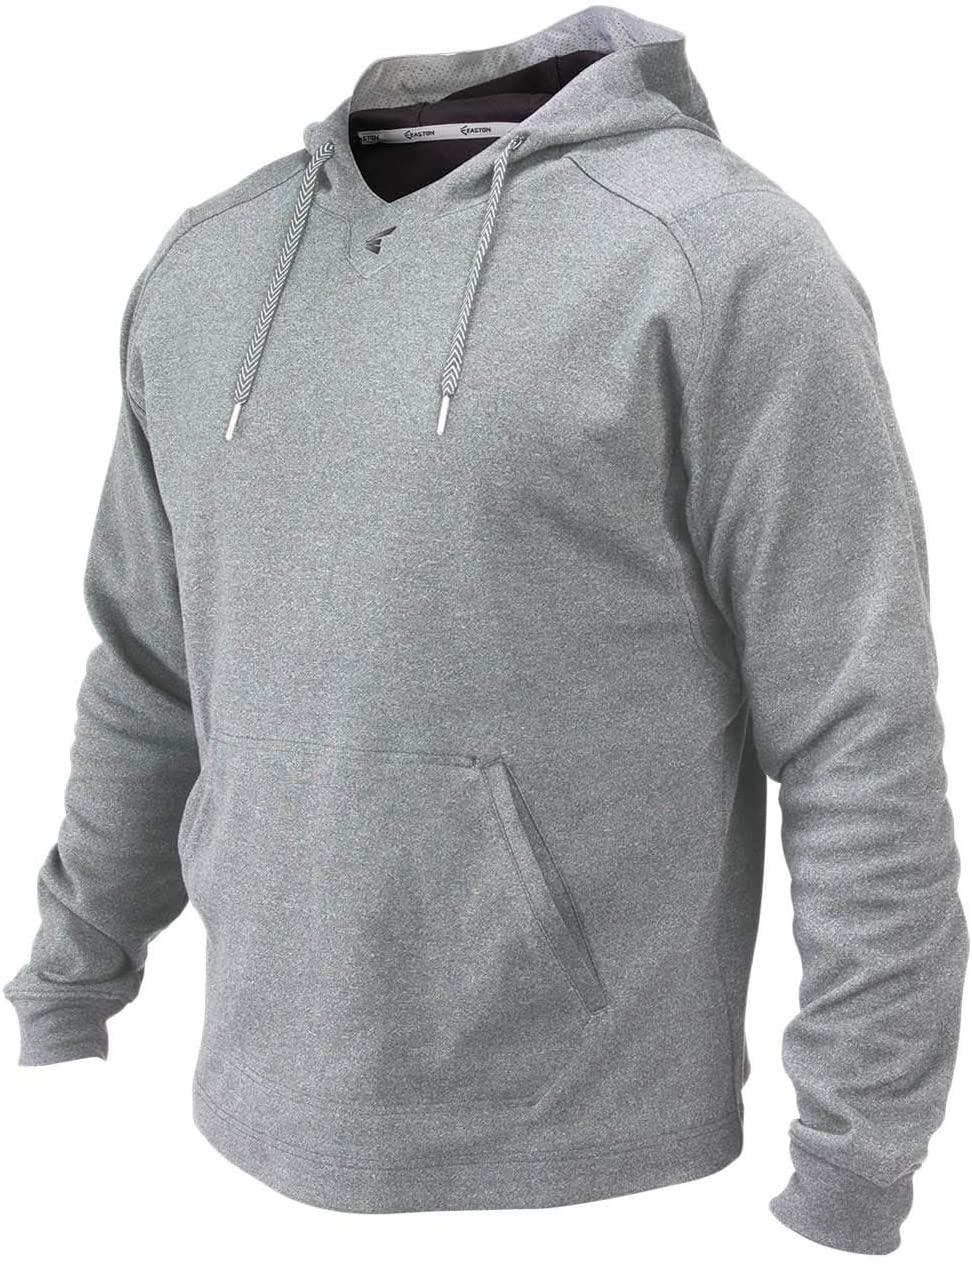 EASTON M10 Hoodie, Adult, Youth, Soft Double Knit Tech Fleece